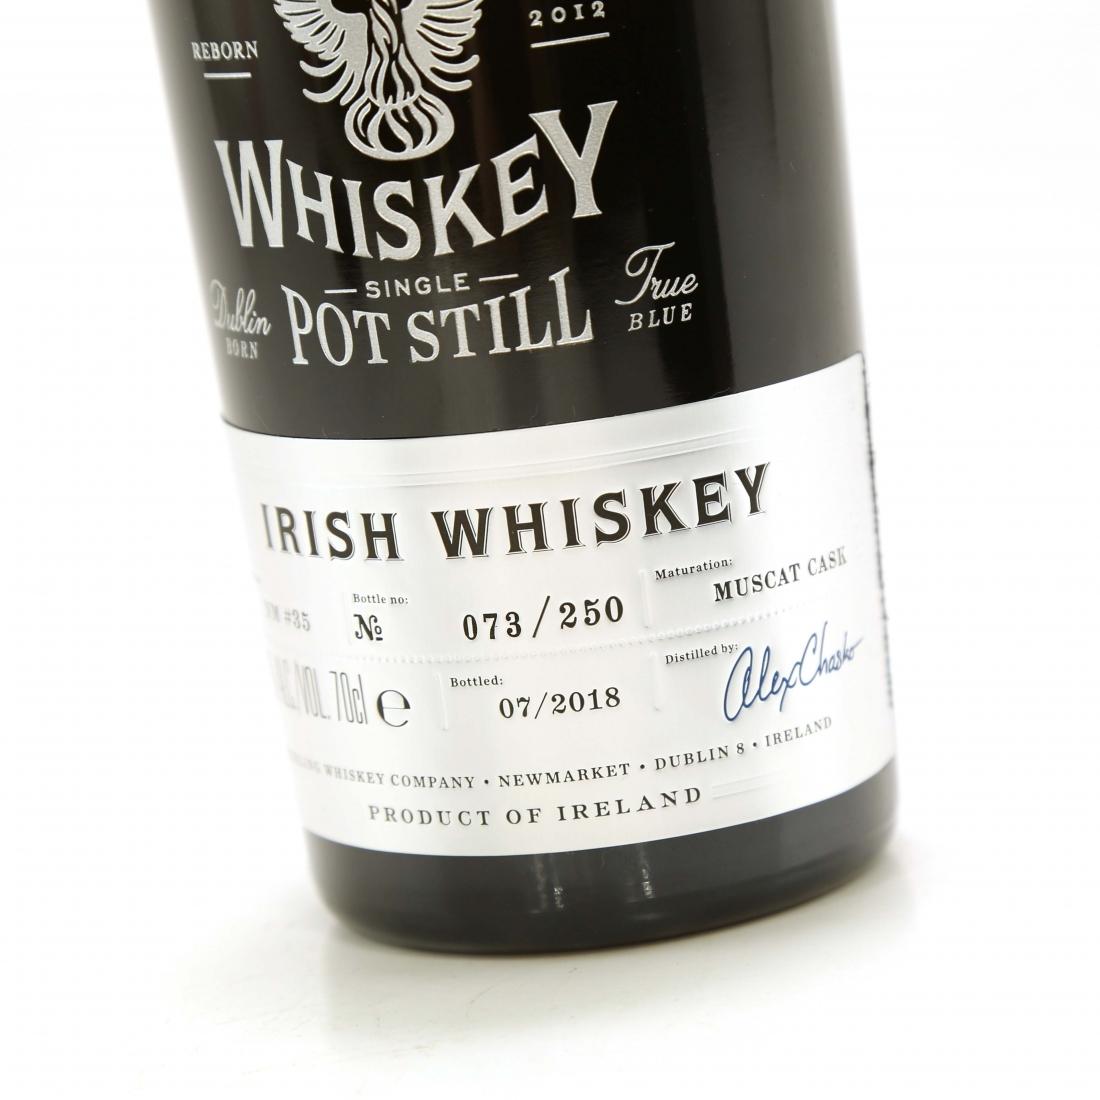 Teeling Celebratory Single Pot Still Whiskey / Bottle #073